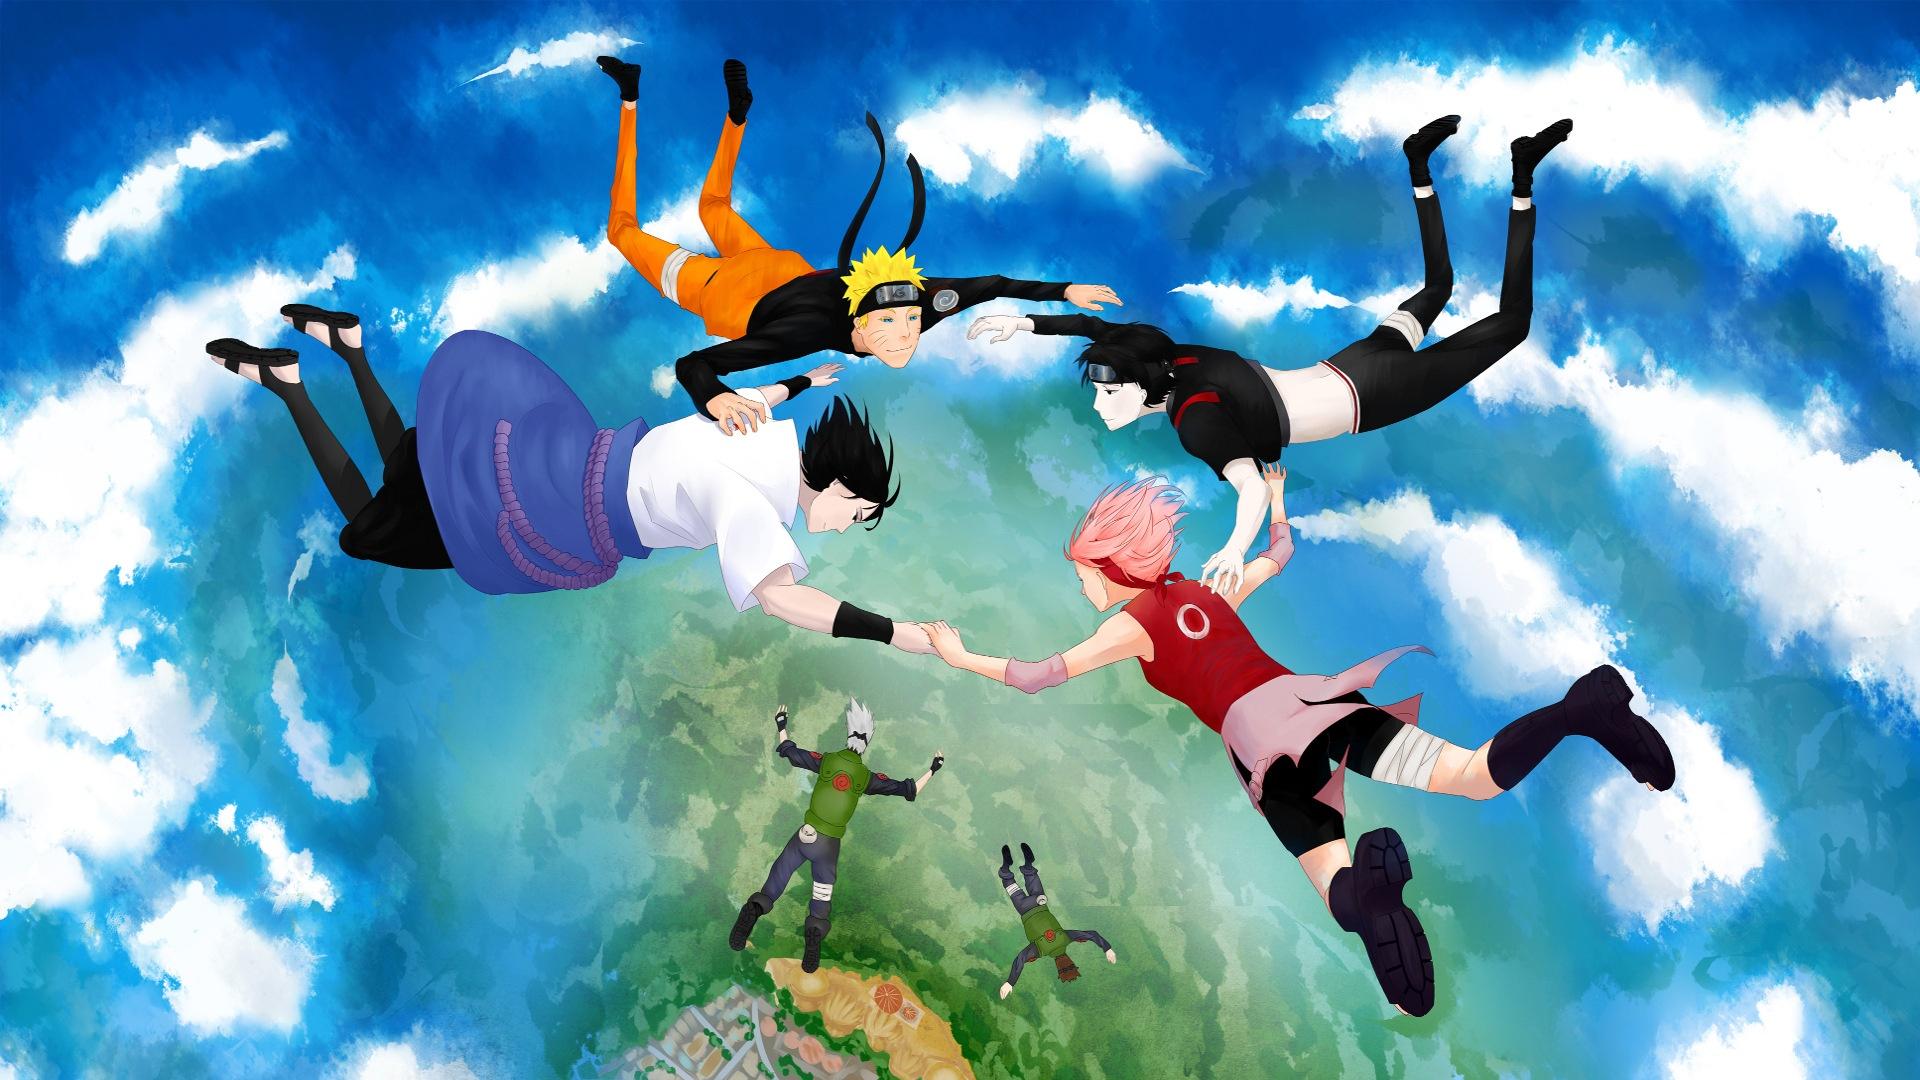 Naruto background wallpaper